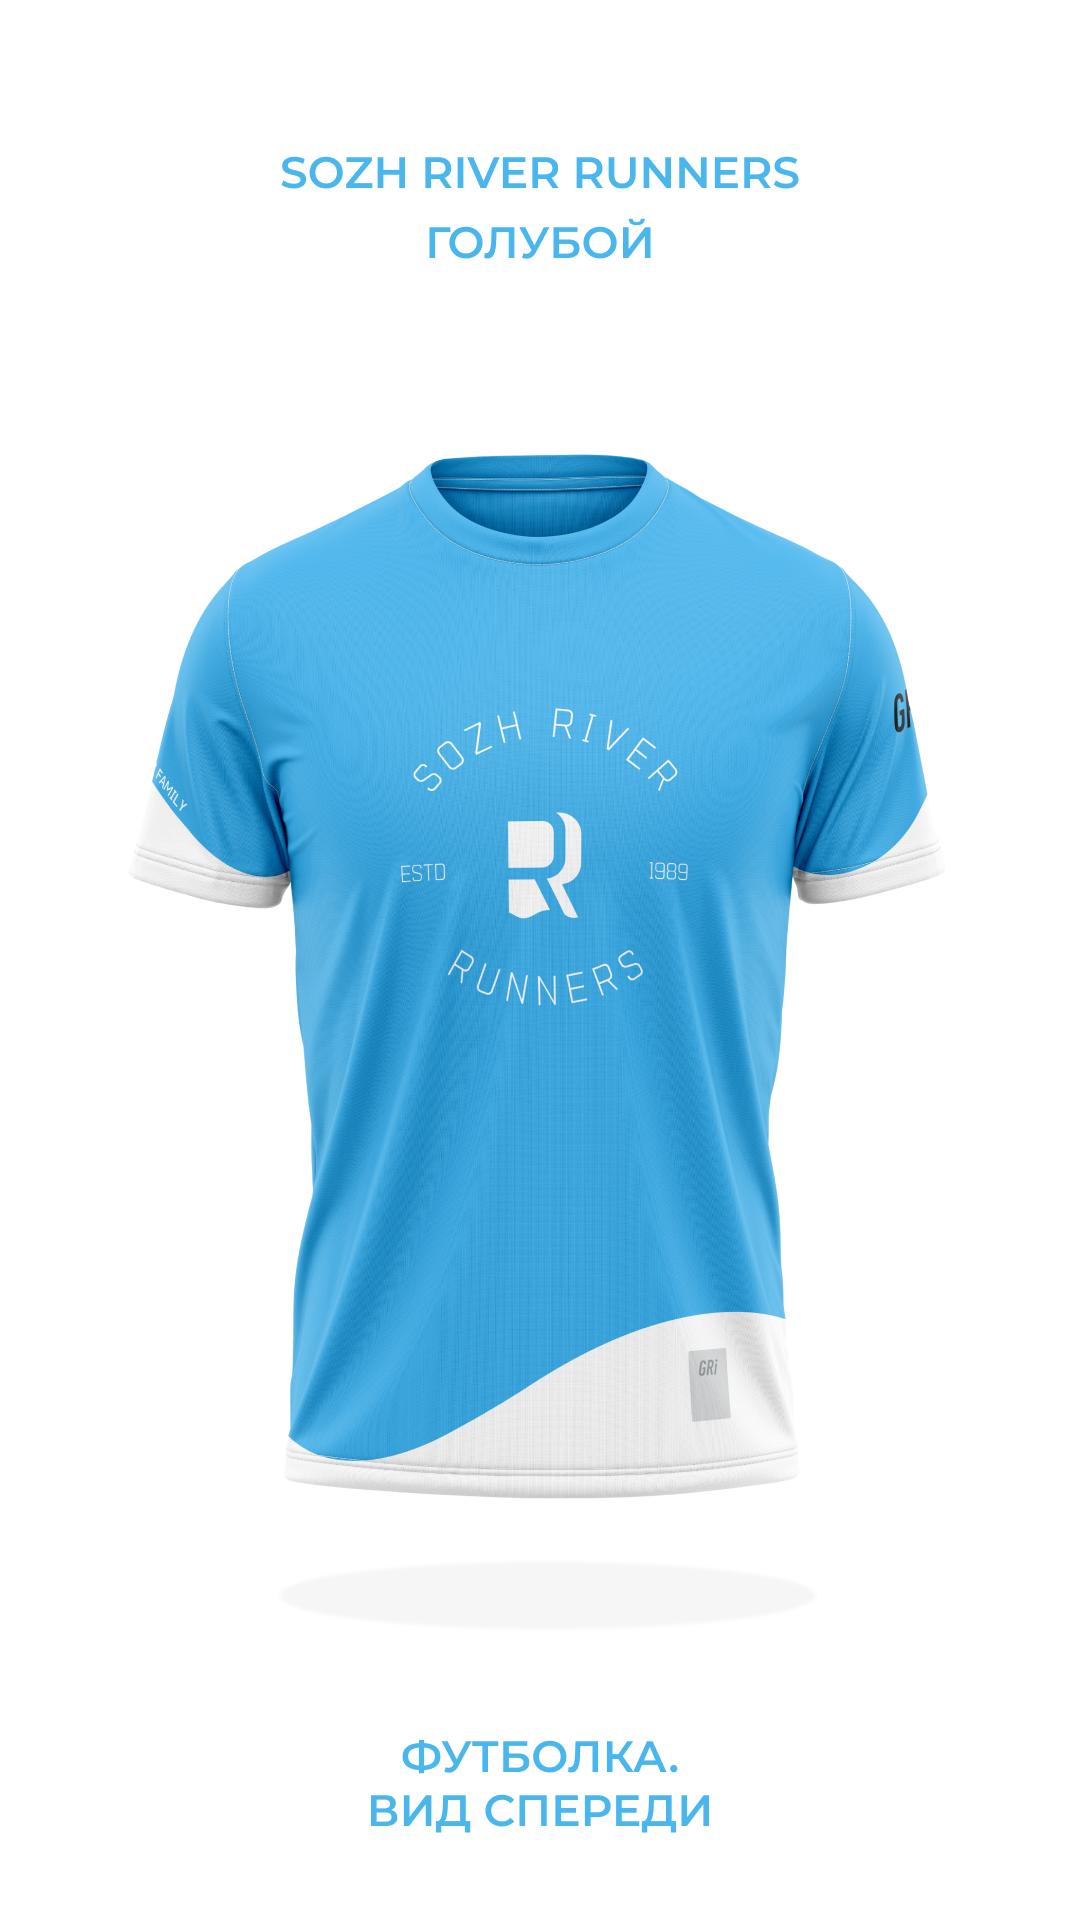 Футболка клубная GRi SRR, голубая, мужская